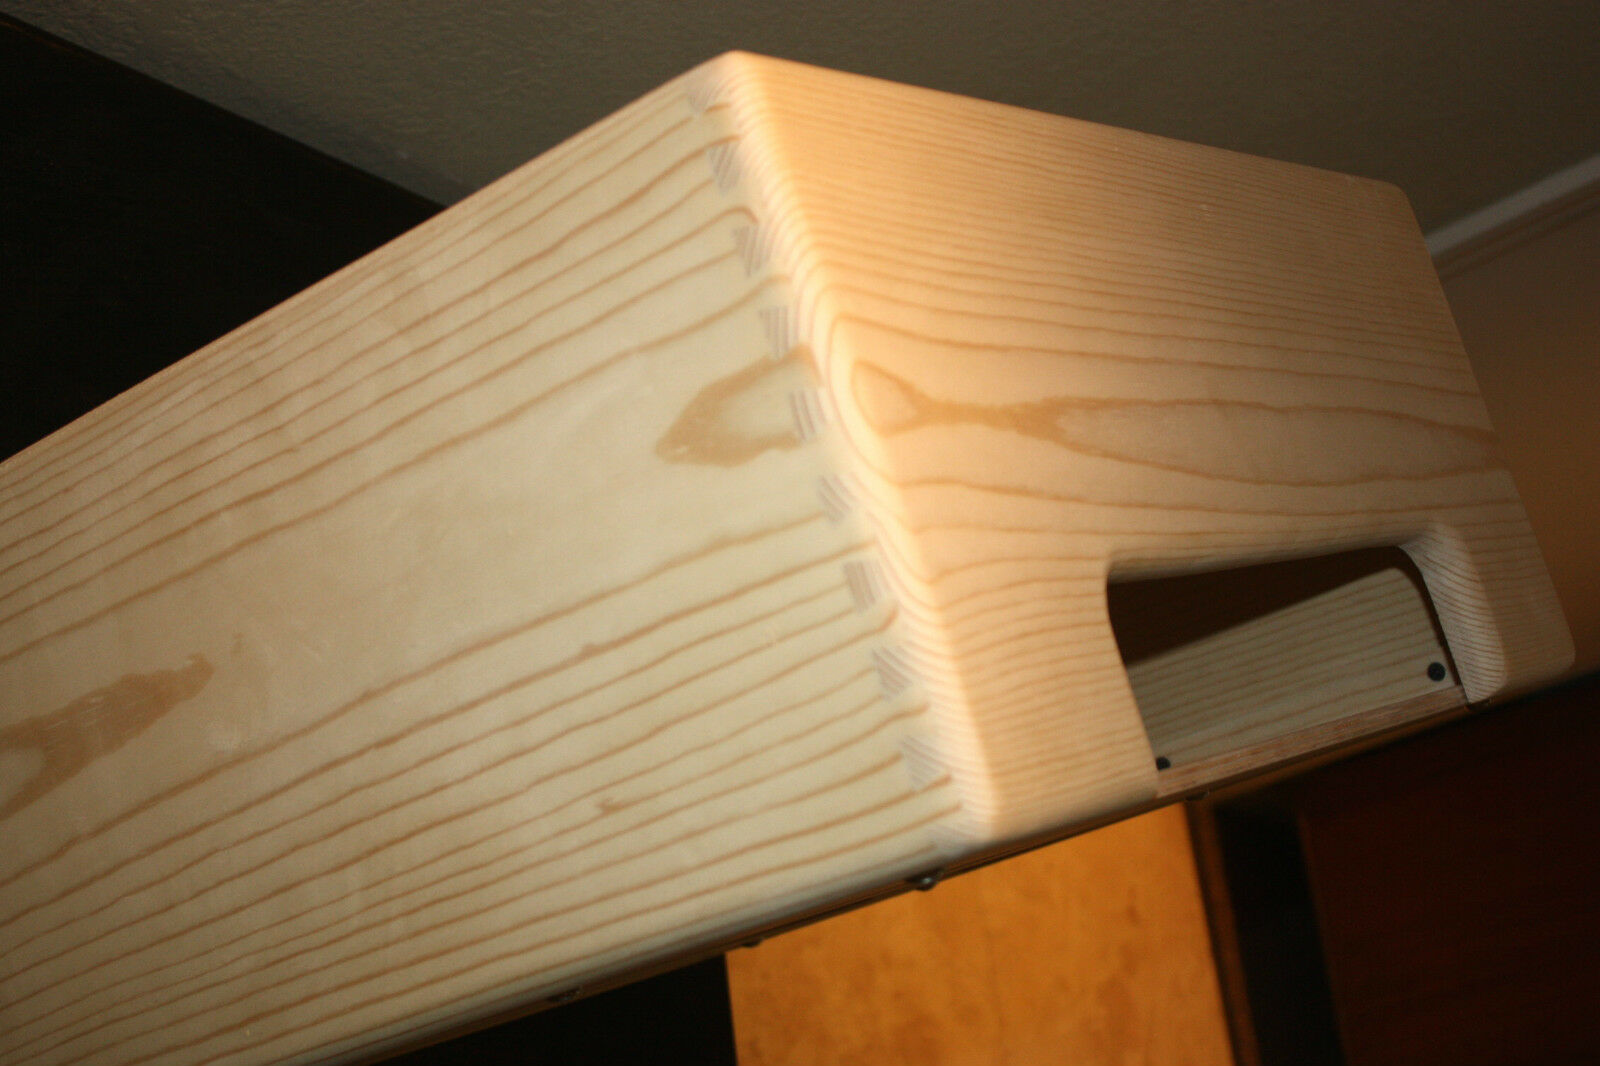 1x12 Guitar Cabinet Empty Rawcabs Diy Oversized Empty 1x12 Pine Narrow Panel Tweed Style